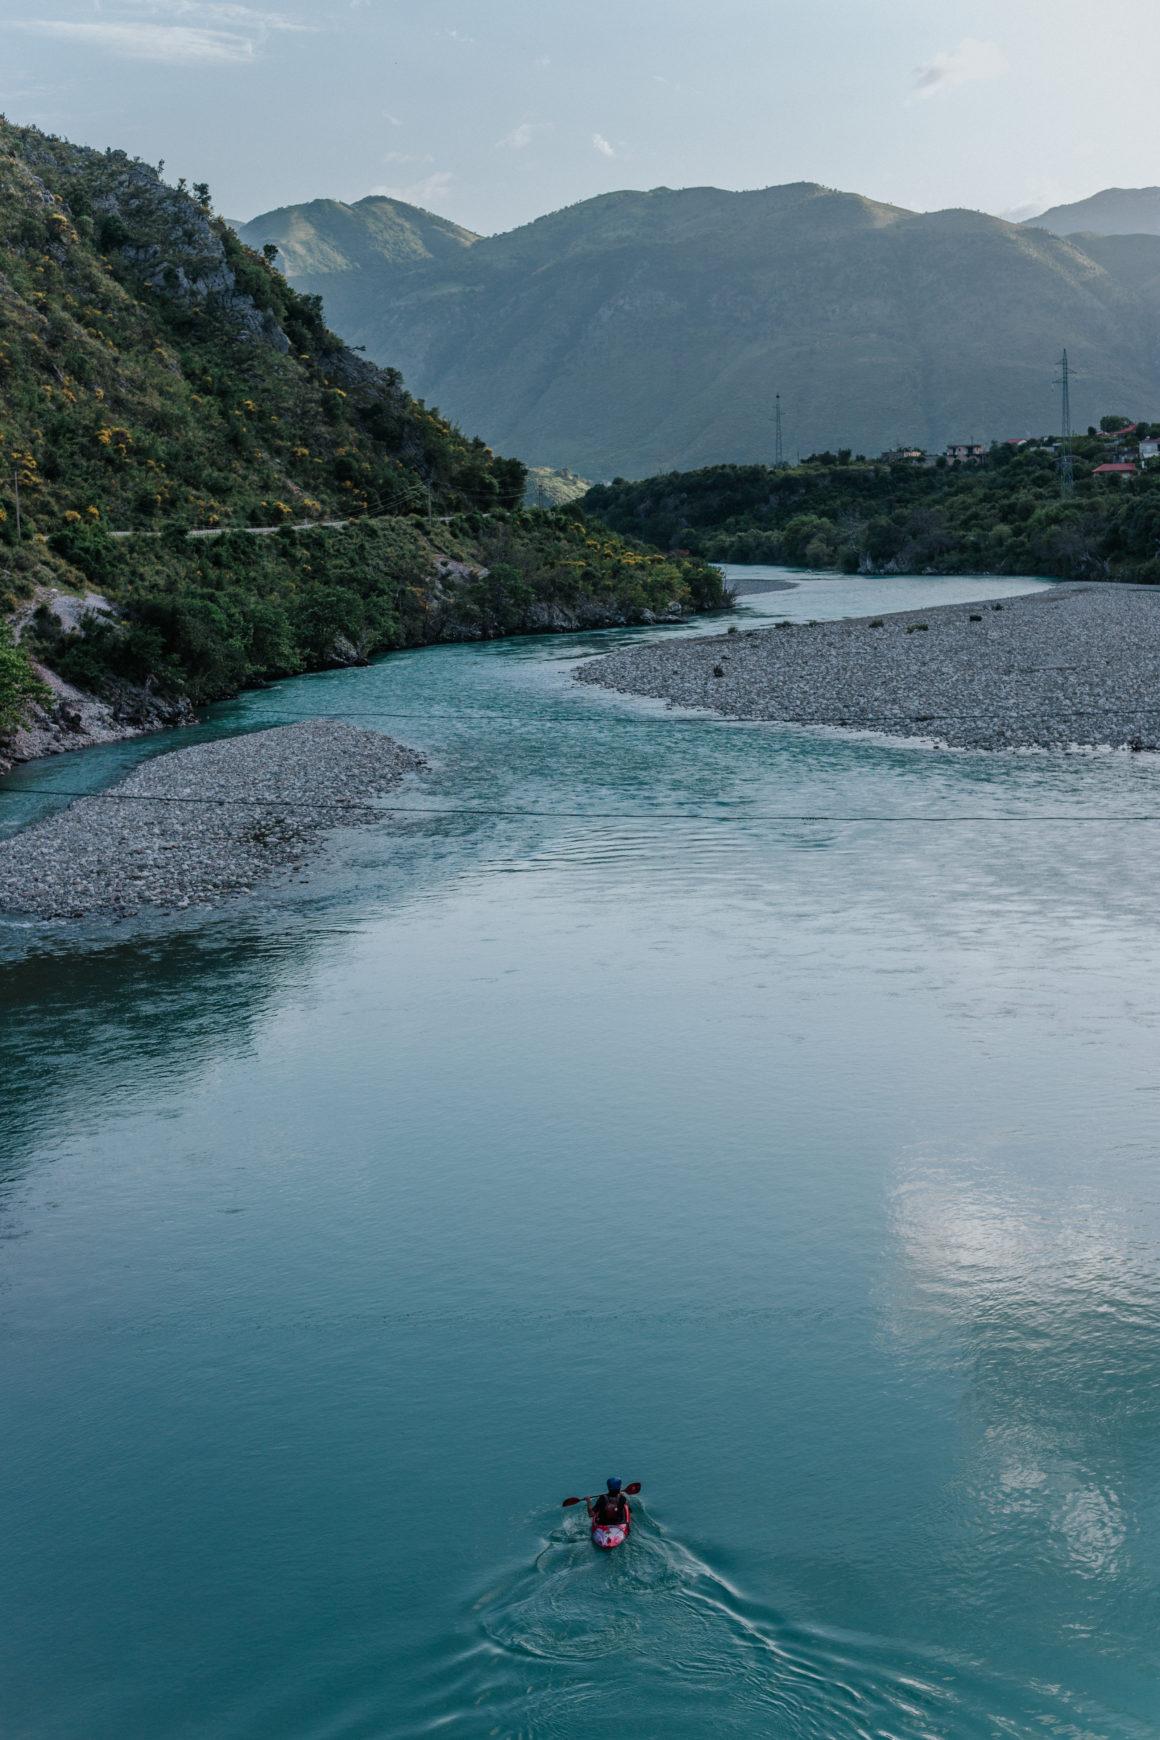 Cultural ecosystem services of Balkan rivers